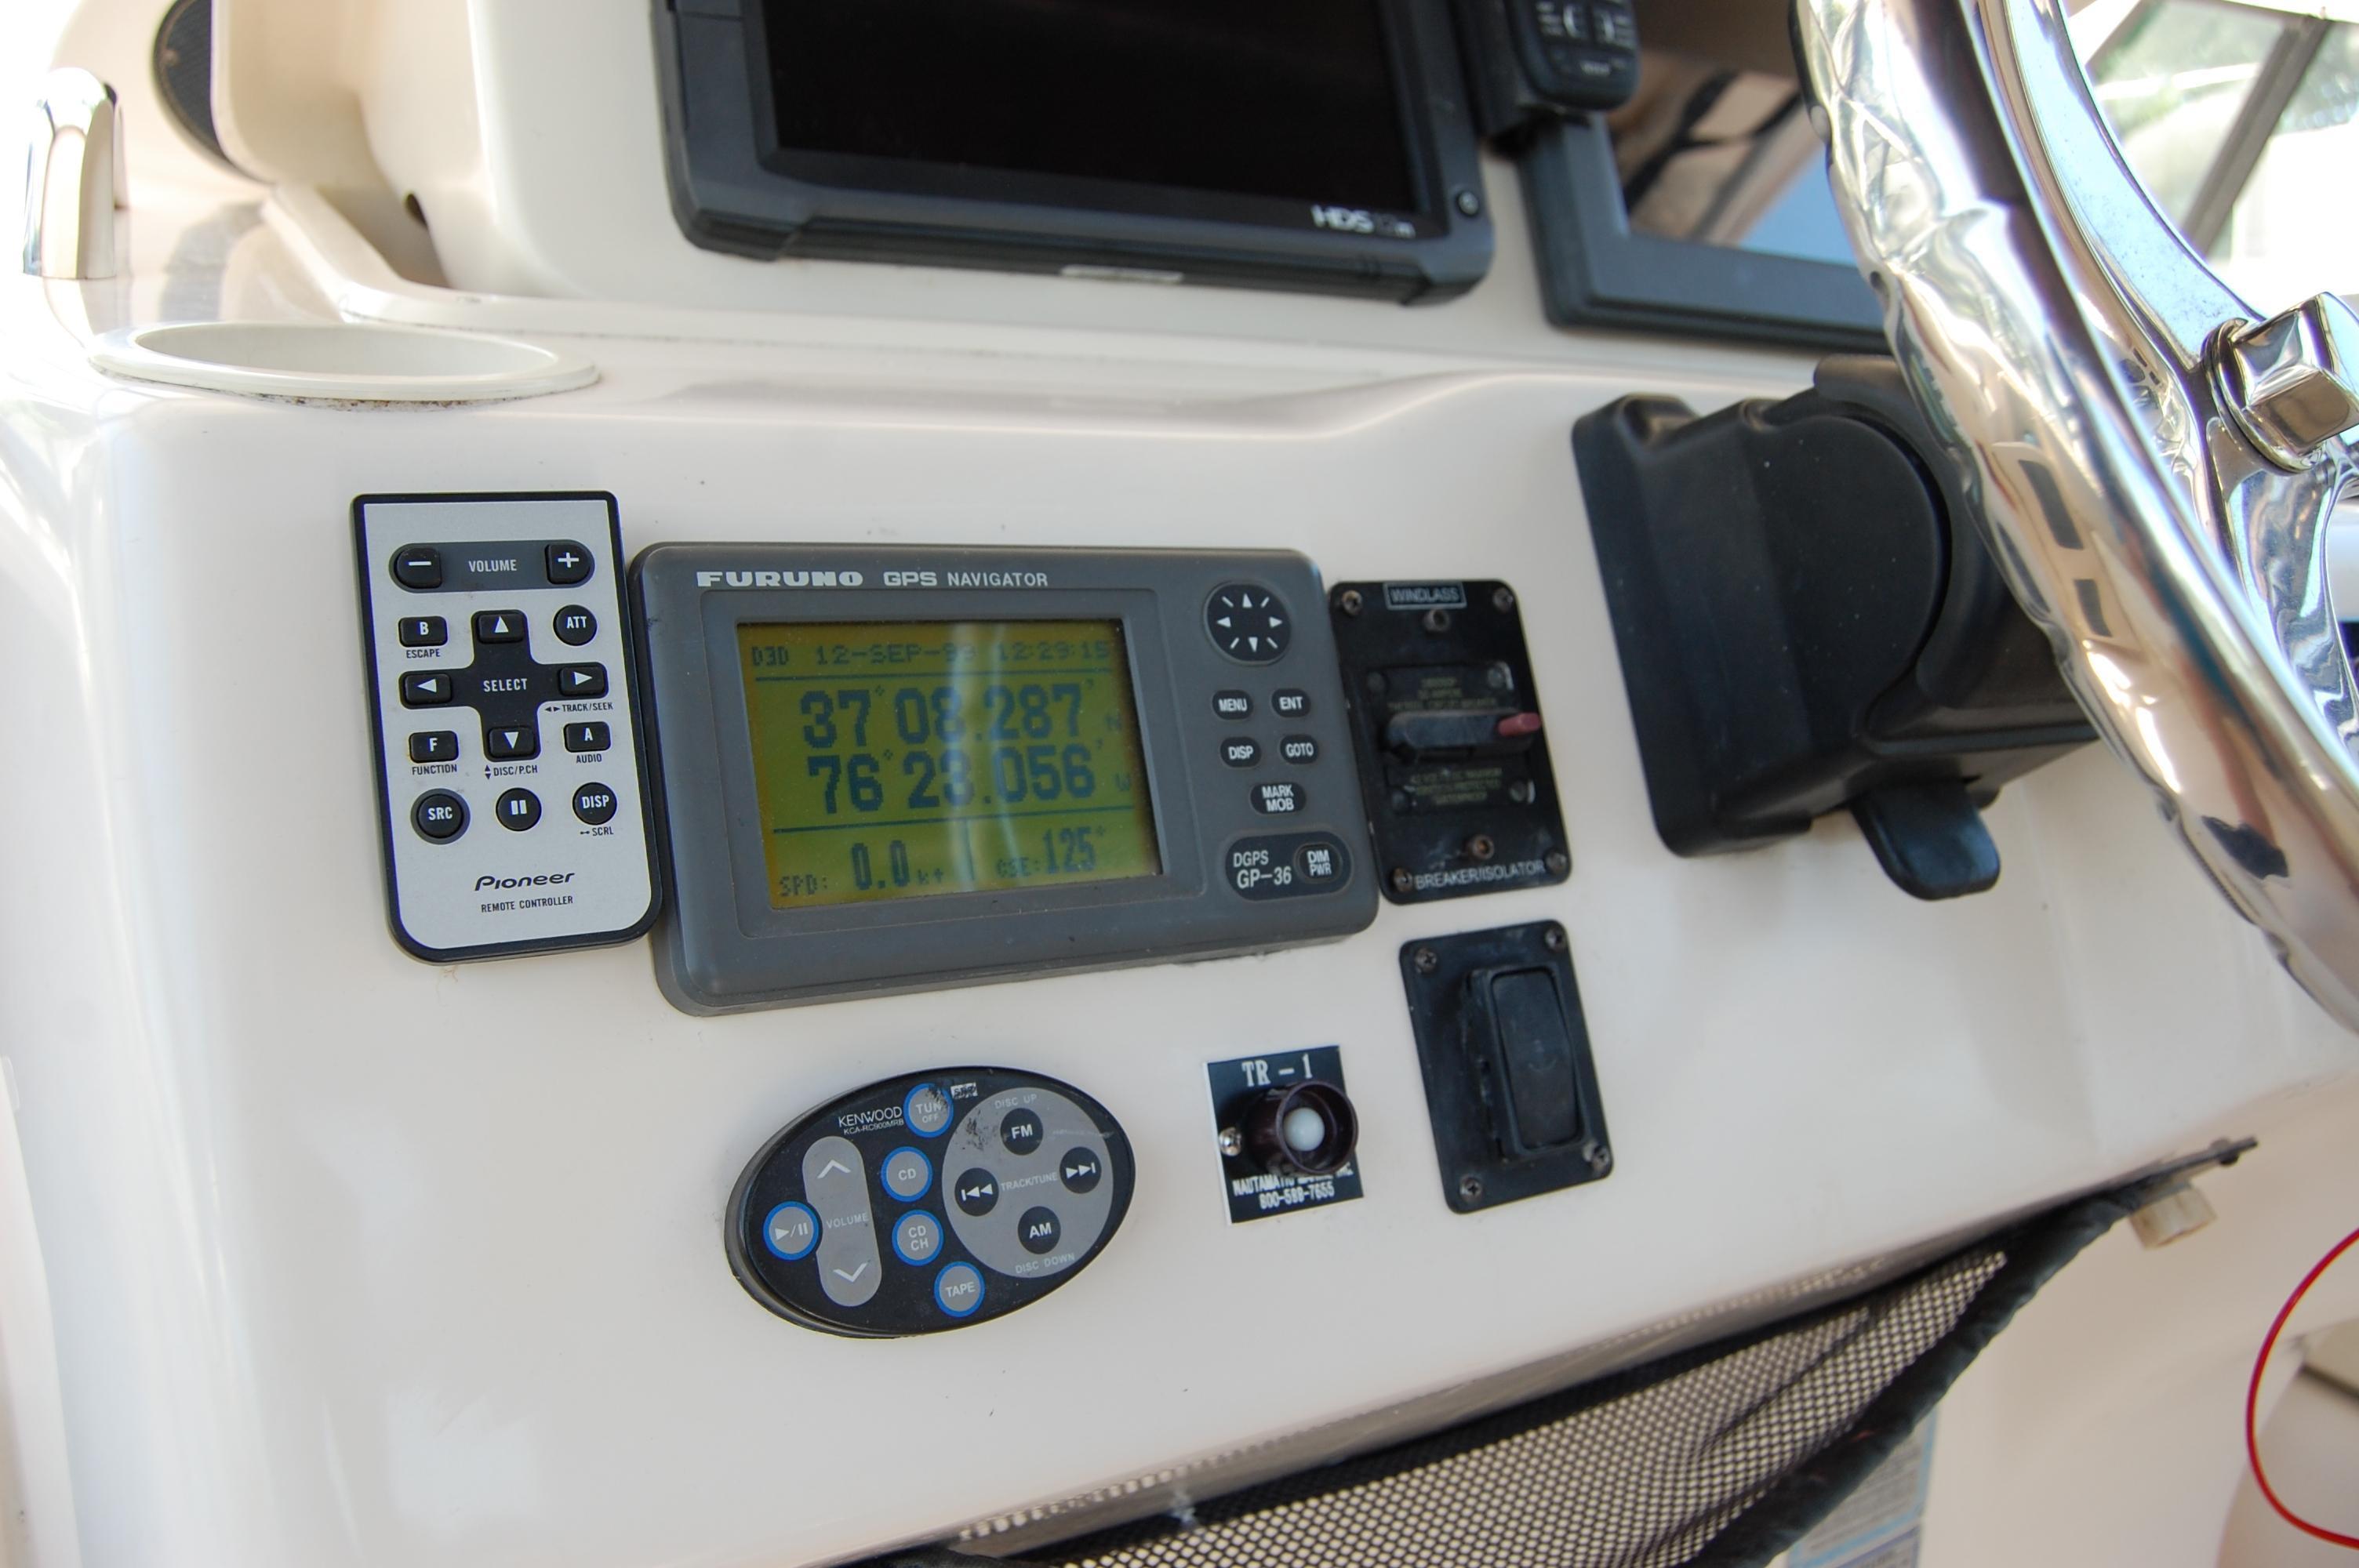 2002 Grady White 330 Express, stereo remote, Furuno DGPS, Windlass control, Tilt steering